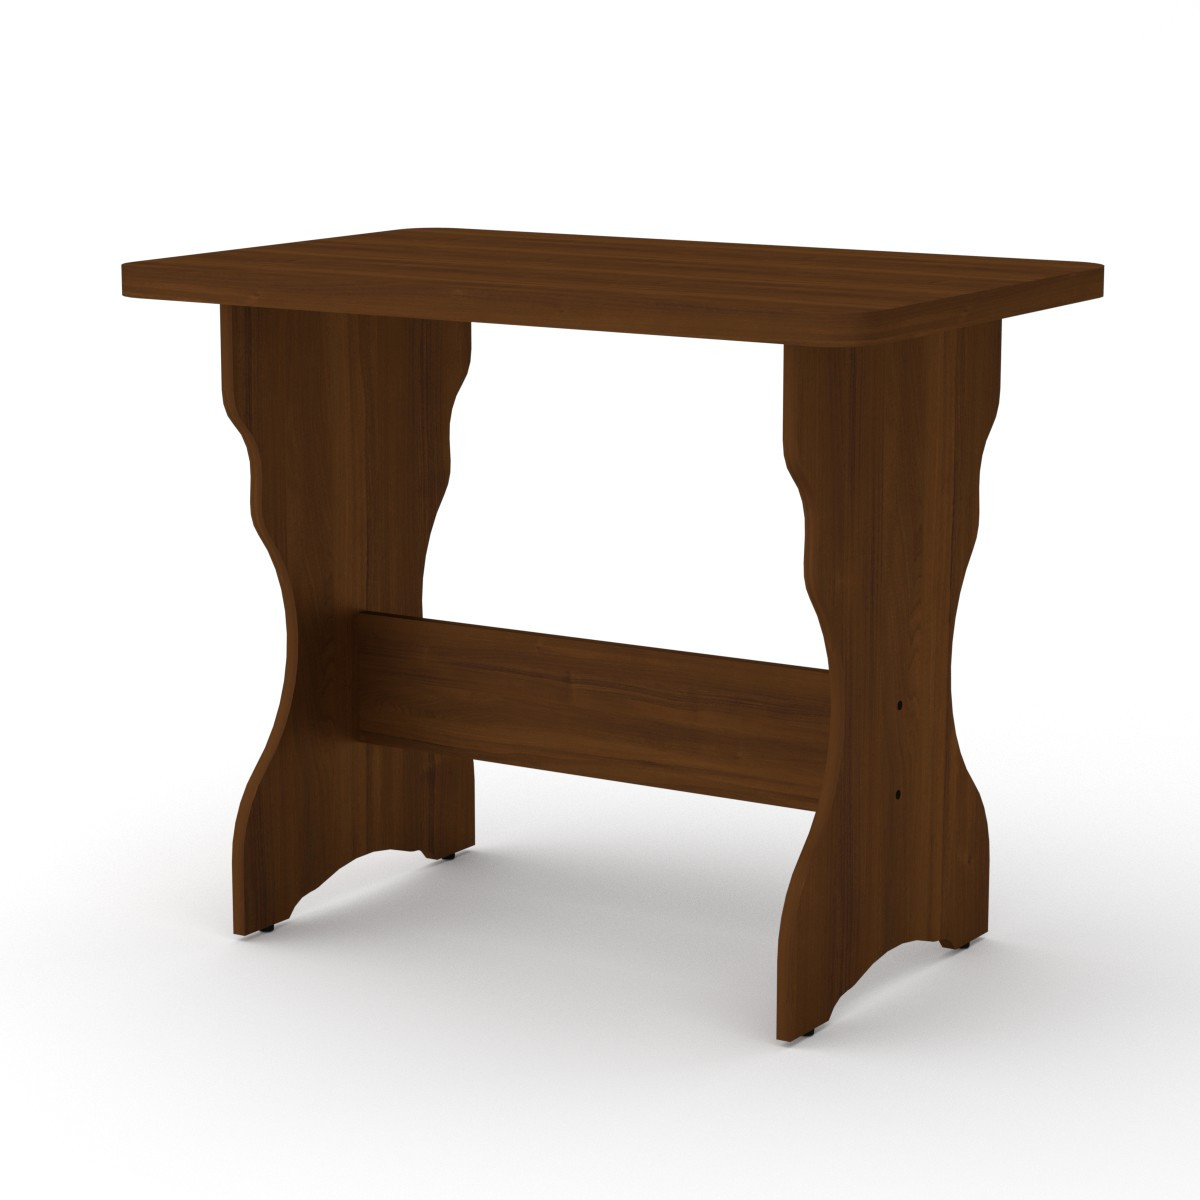 Стол кухонный КС-3 яблоня Компанит (90х59х73 см), фото 7